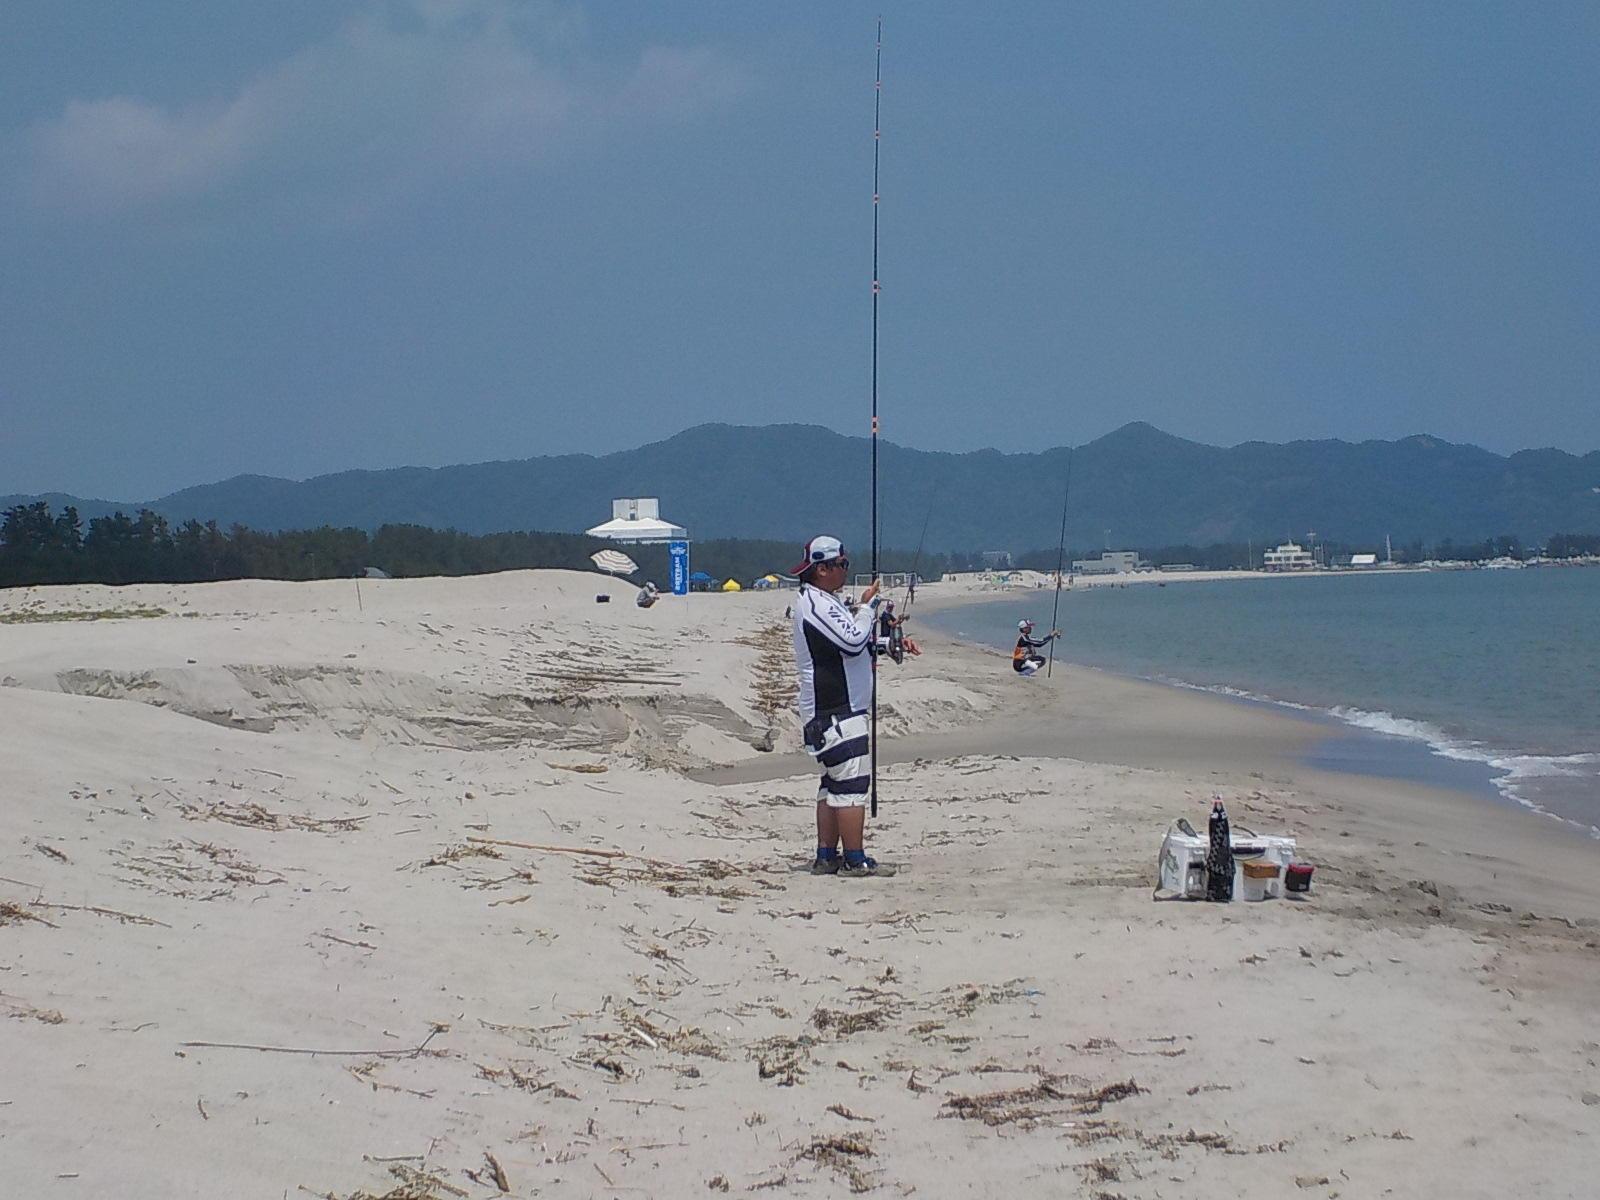 Cブロック大会釣り風景①.JPG